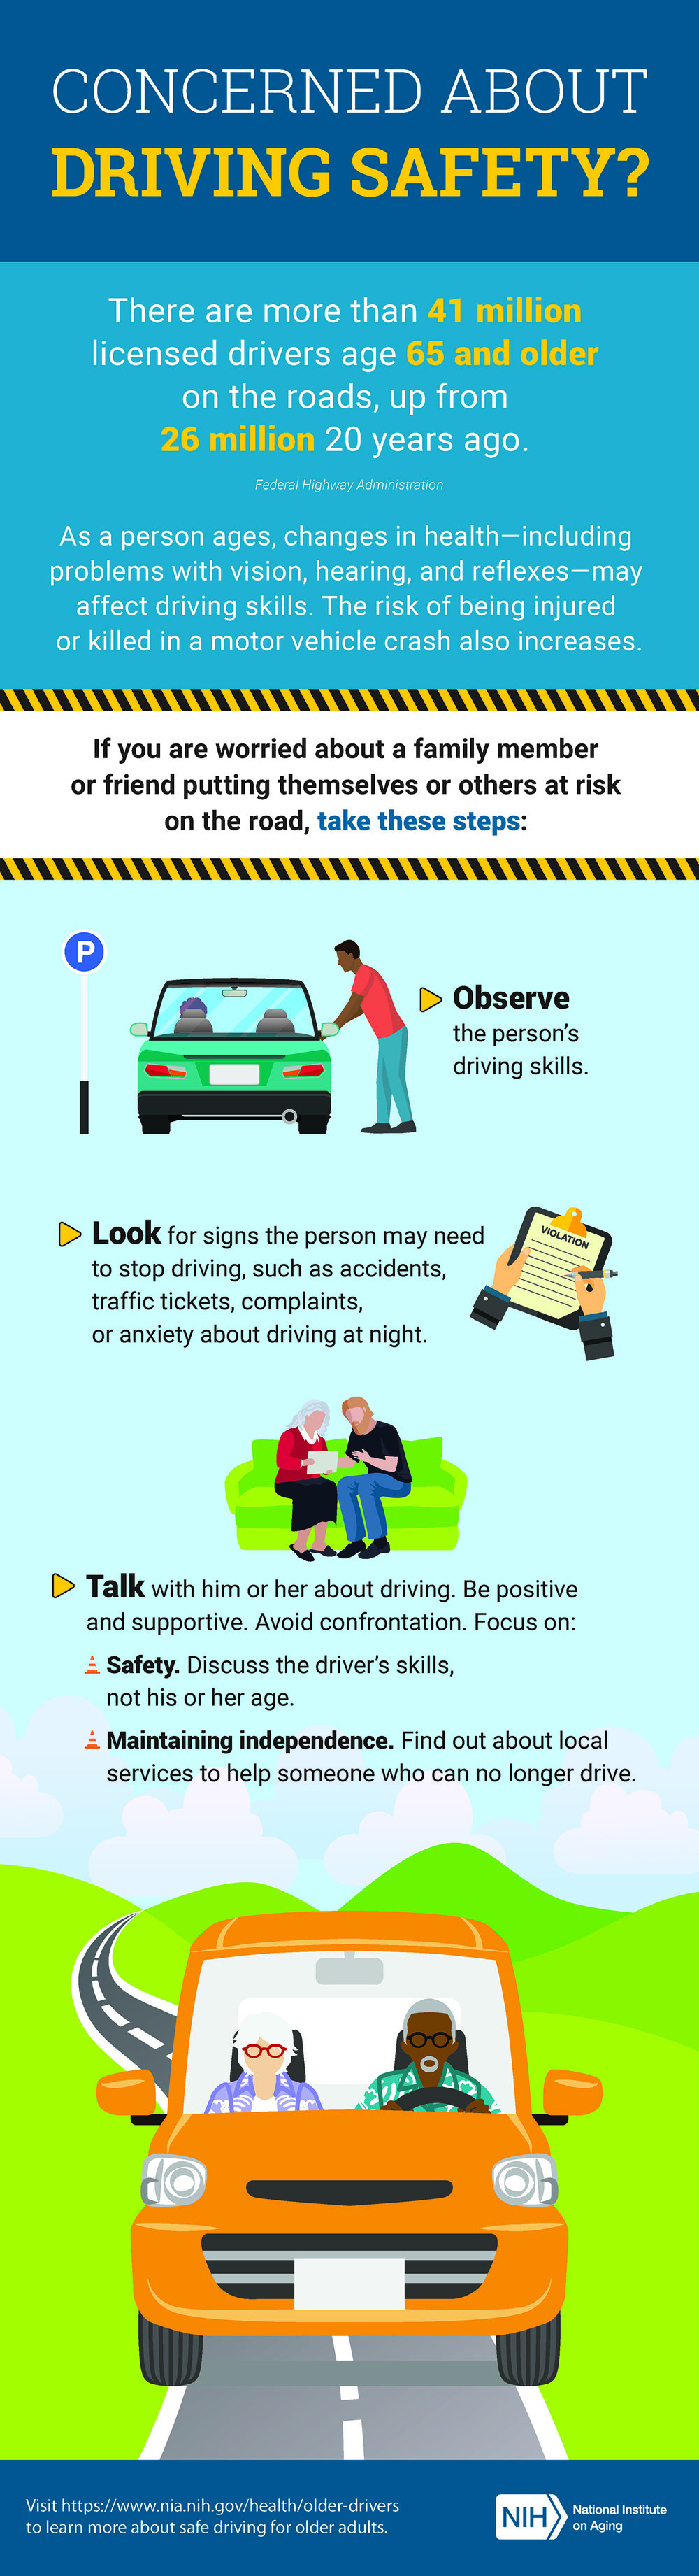 NIA_Older Driver_infographic_2-24-18_cb.jpg